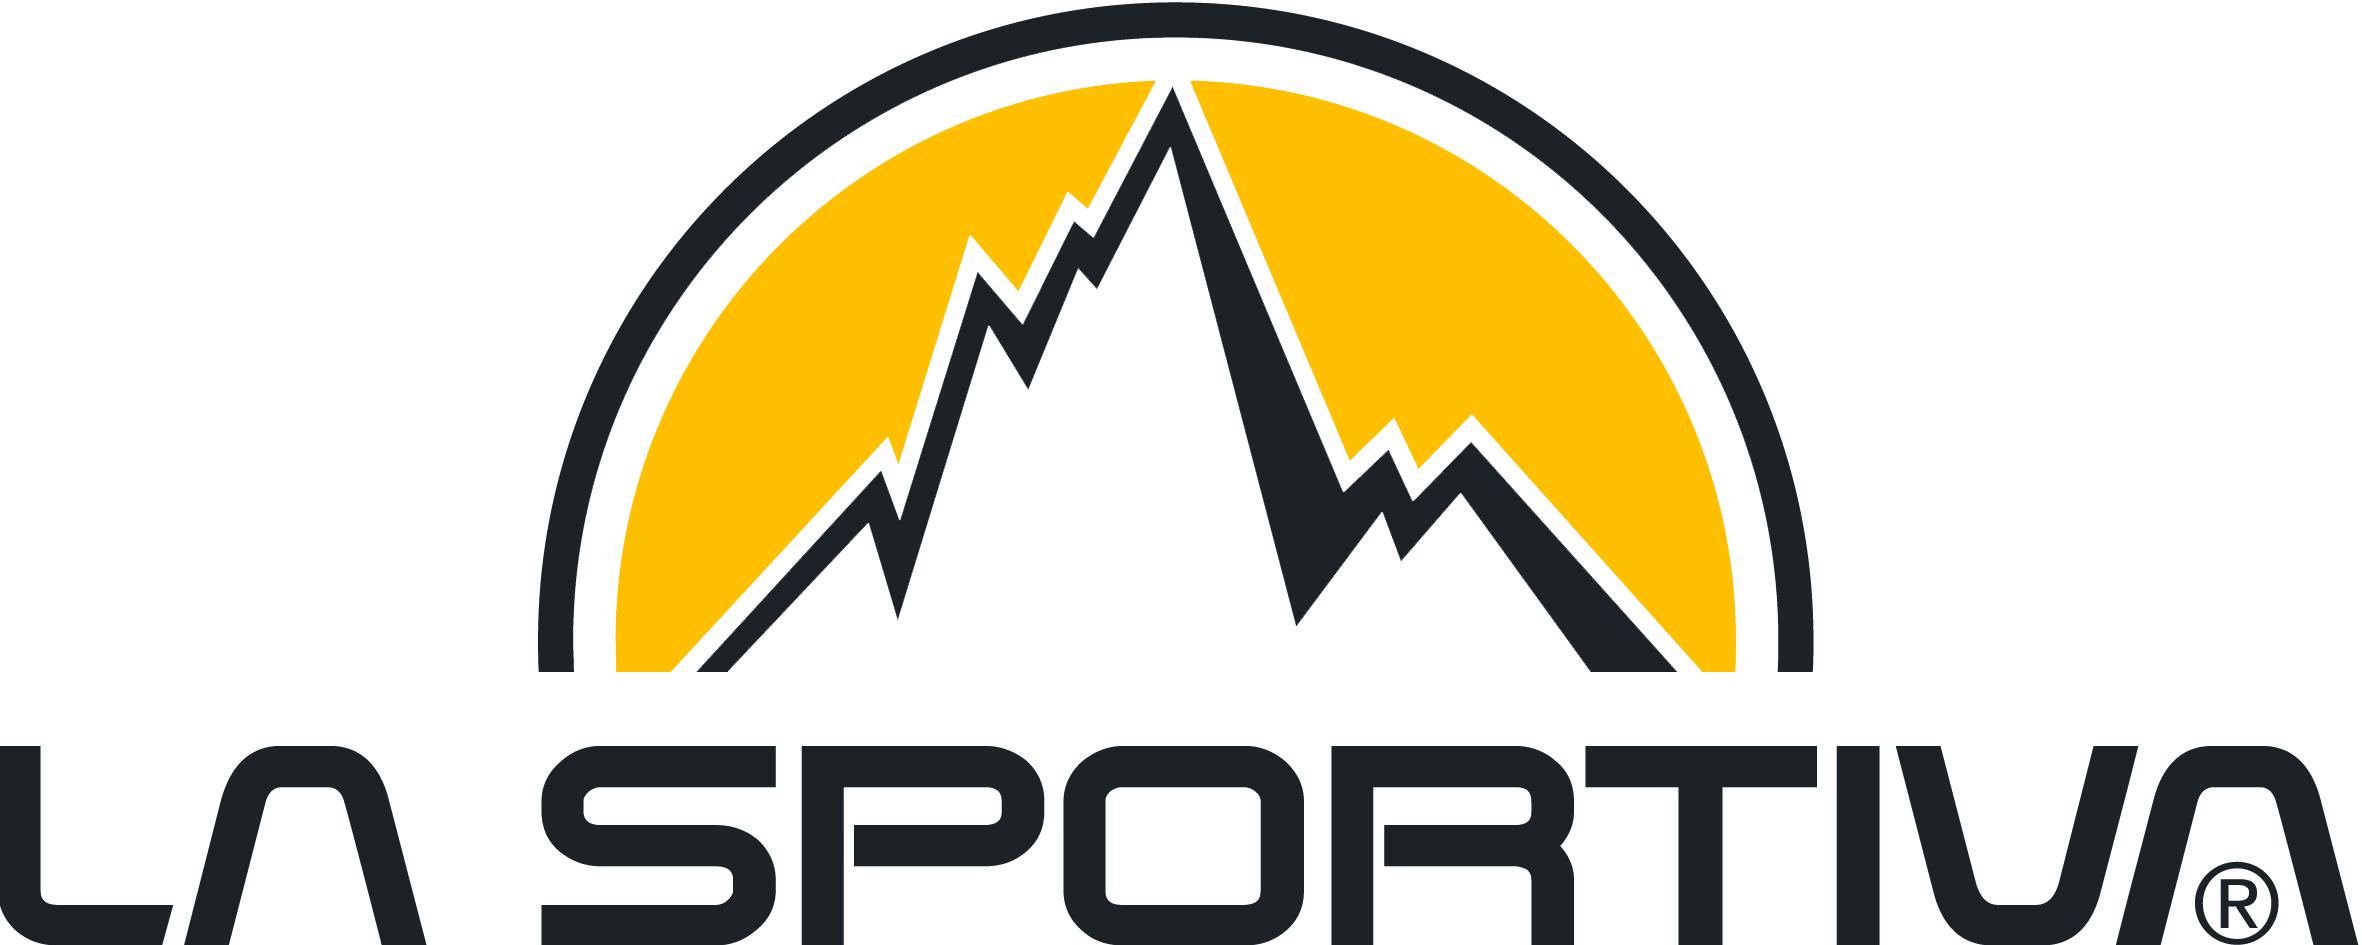 20120917201042!Logolasportiva.jpg